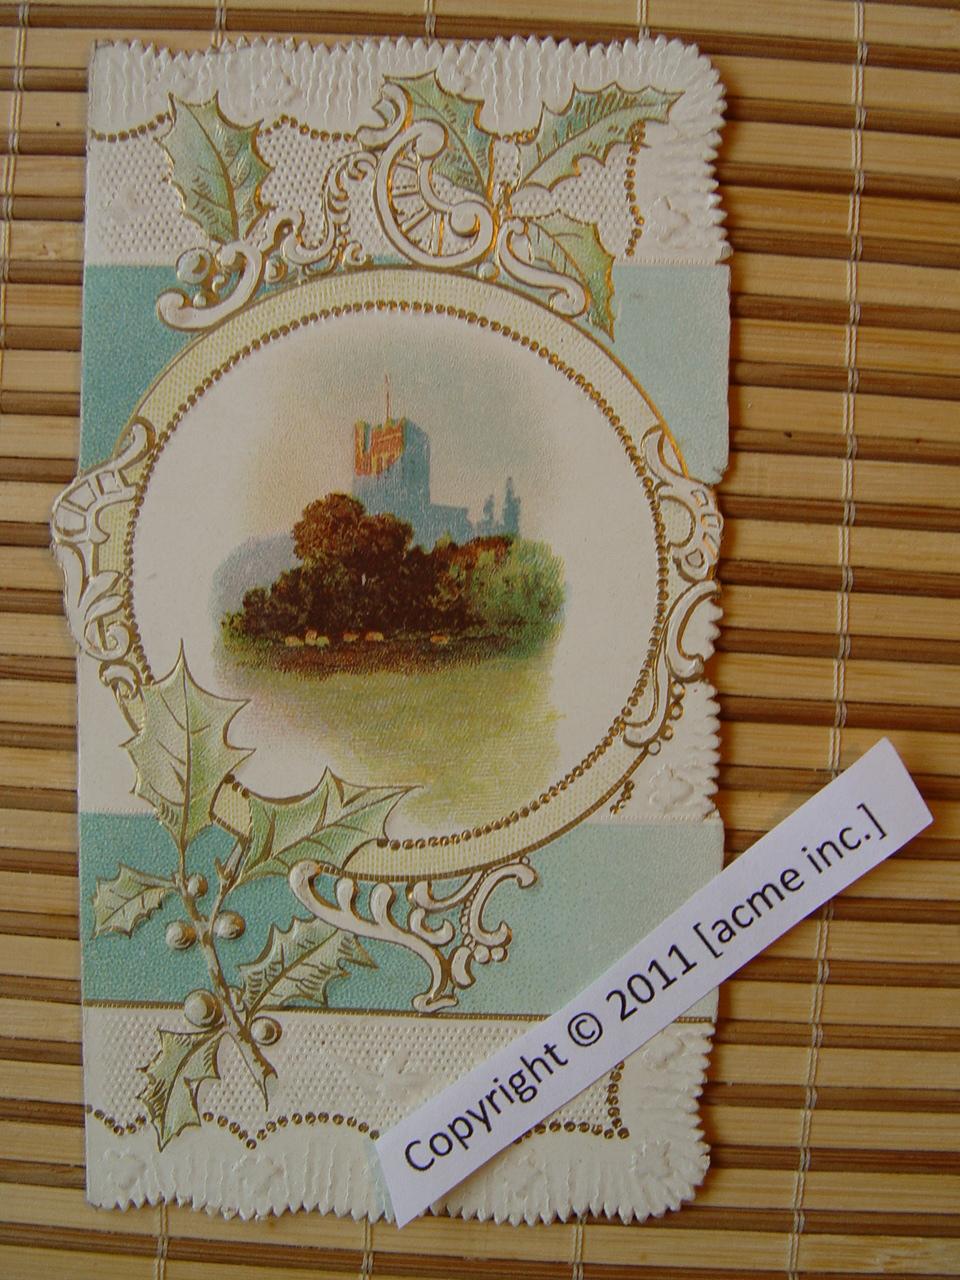 http://www.acme-inc.co.uk/greetingscards/DSC05478.jpg